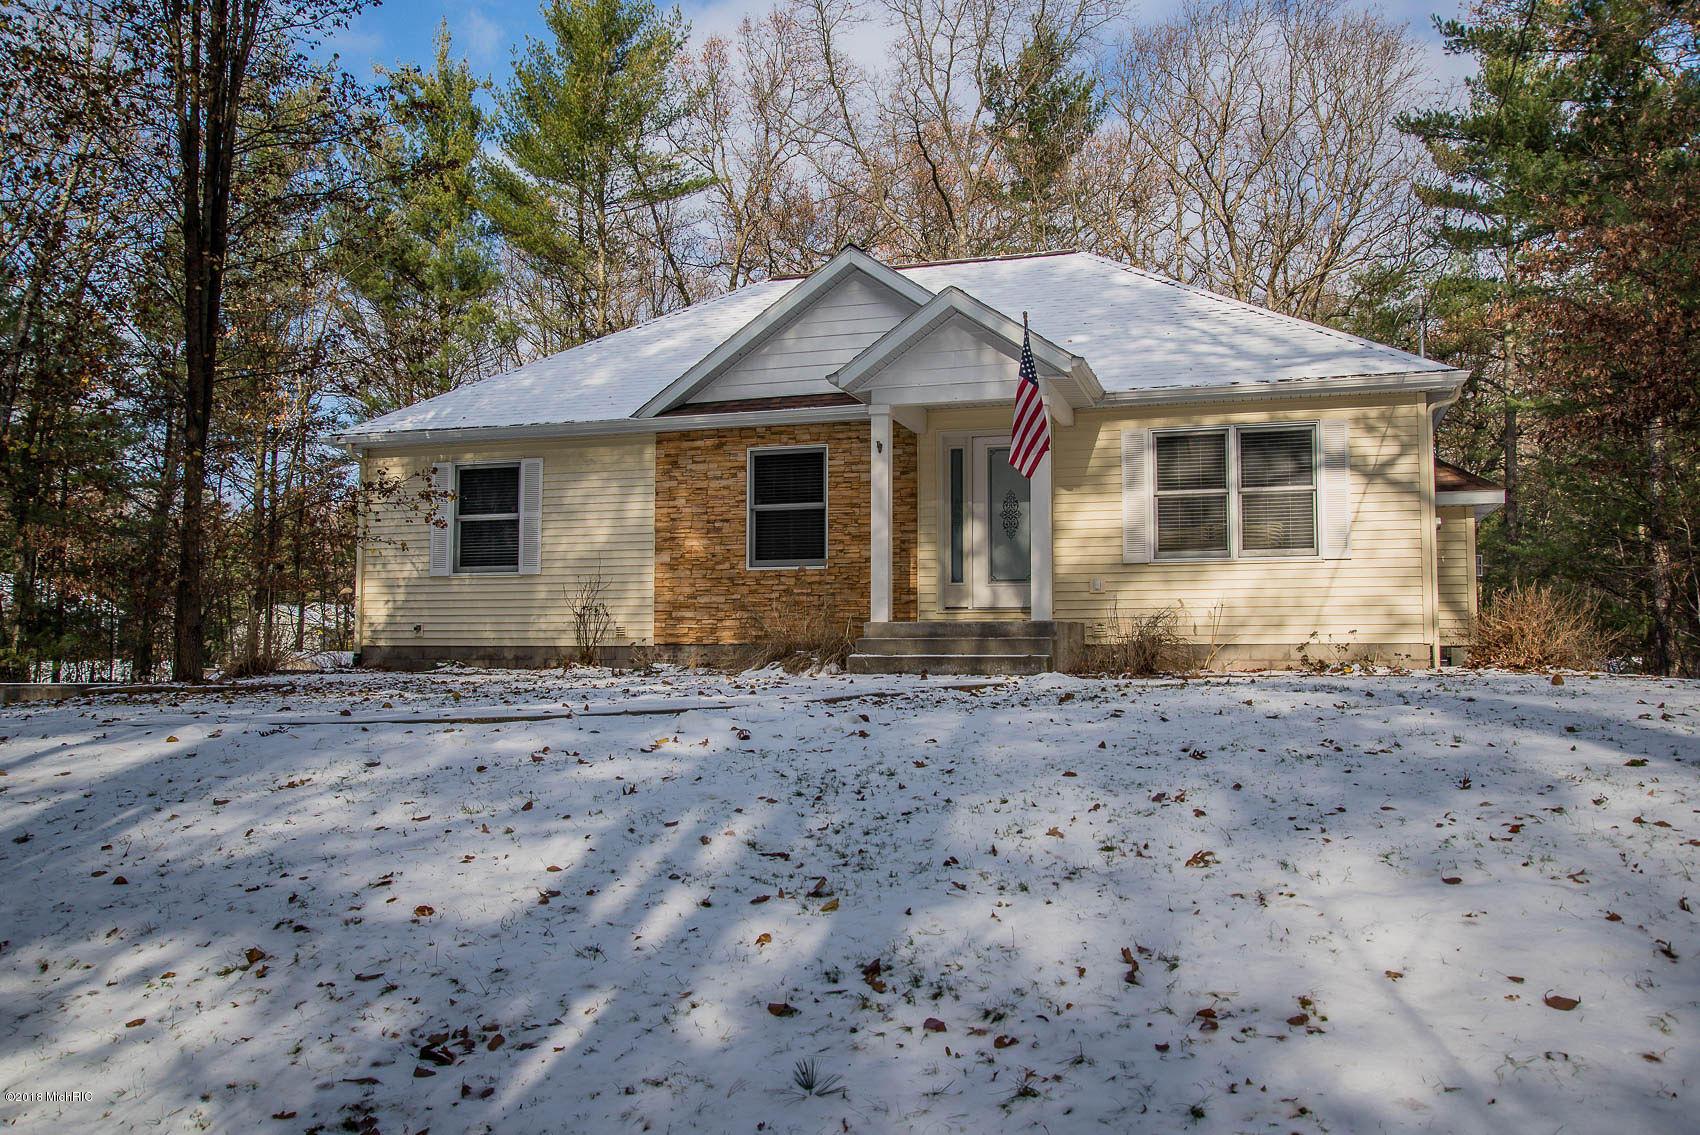 3258 Michillinda Road, Twin Lake, Michigan 49457, 3 Bedrooms Bedrooms, ,3 BathroomsBathrooms,Residential,For Sale,Michillinda,18057939